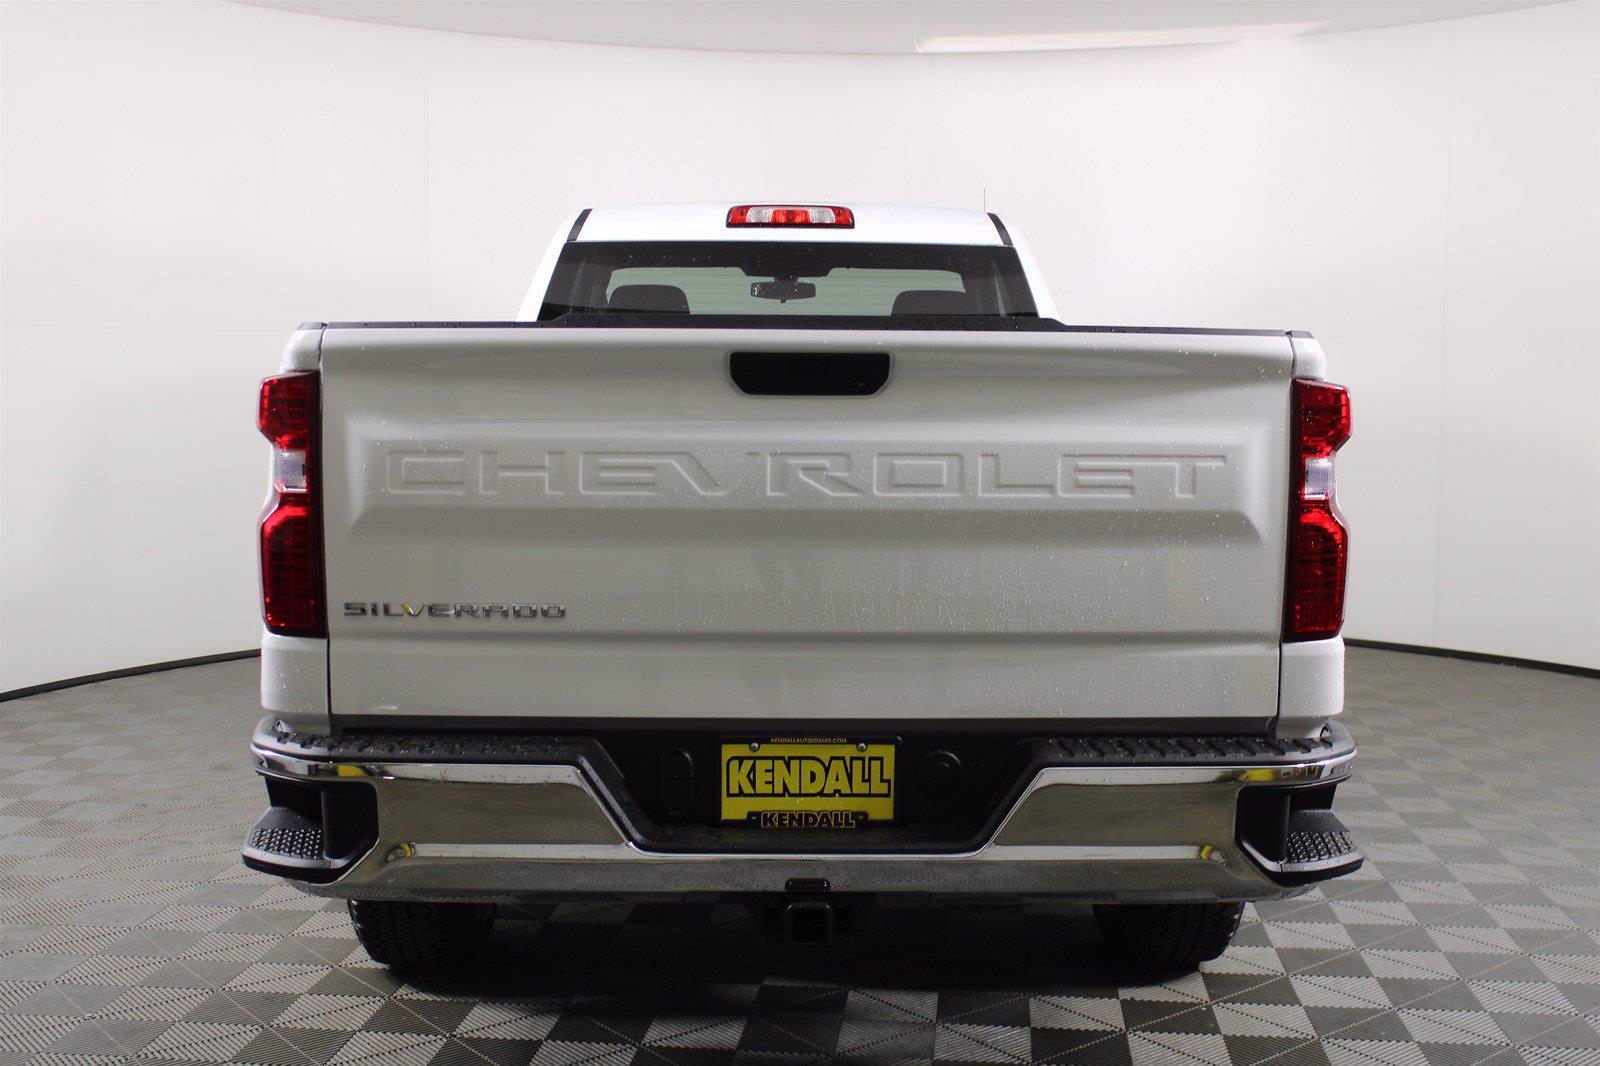 2021 Chevrolet Silverado 1500 Regular Cab 4x2, Pickup #D110764 - photo 8